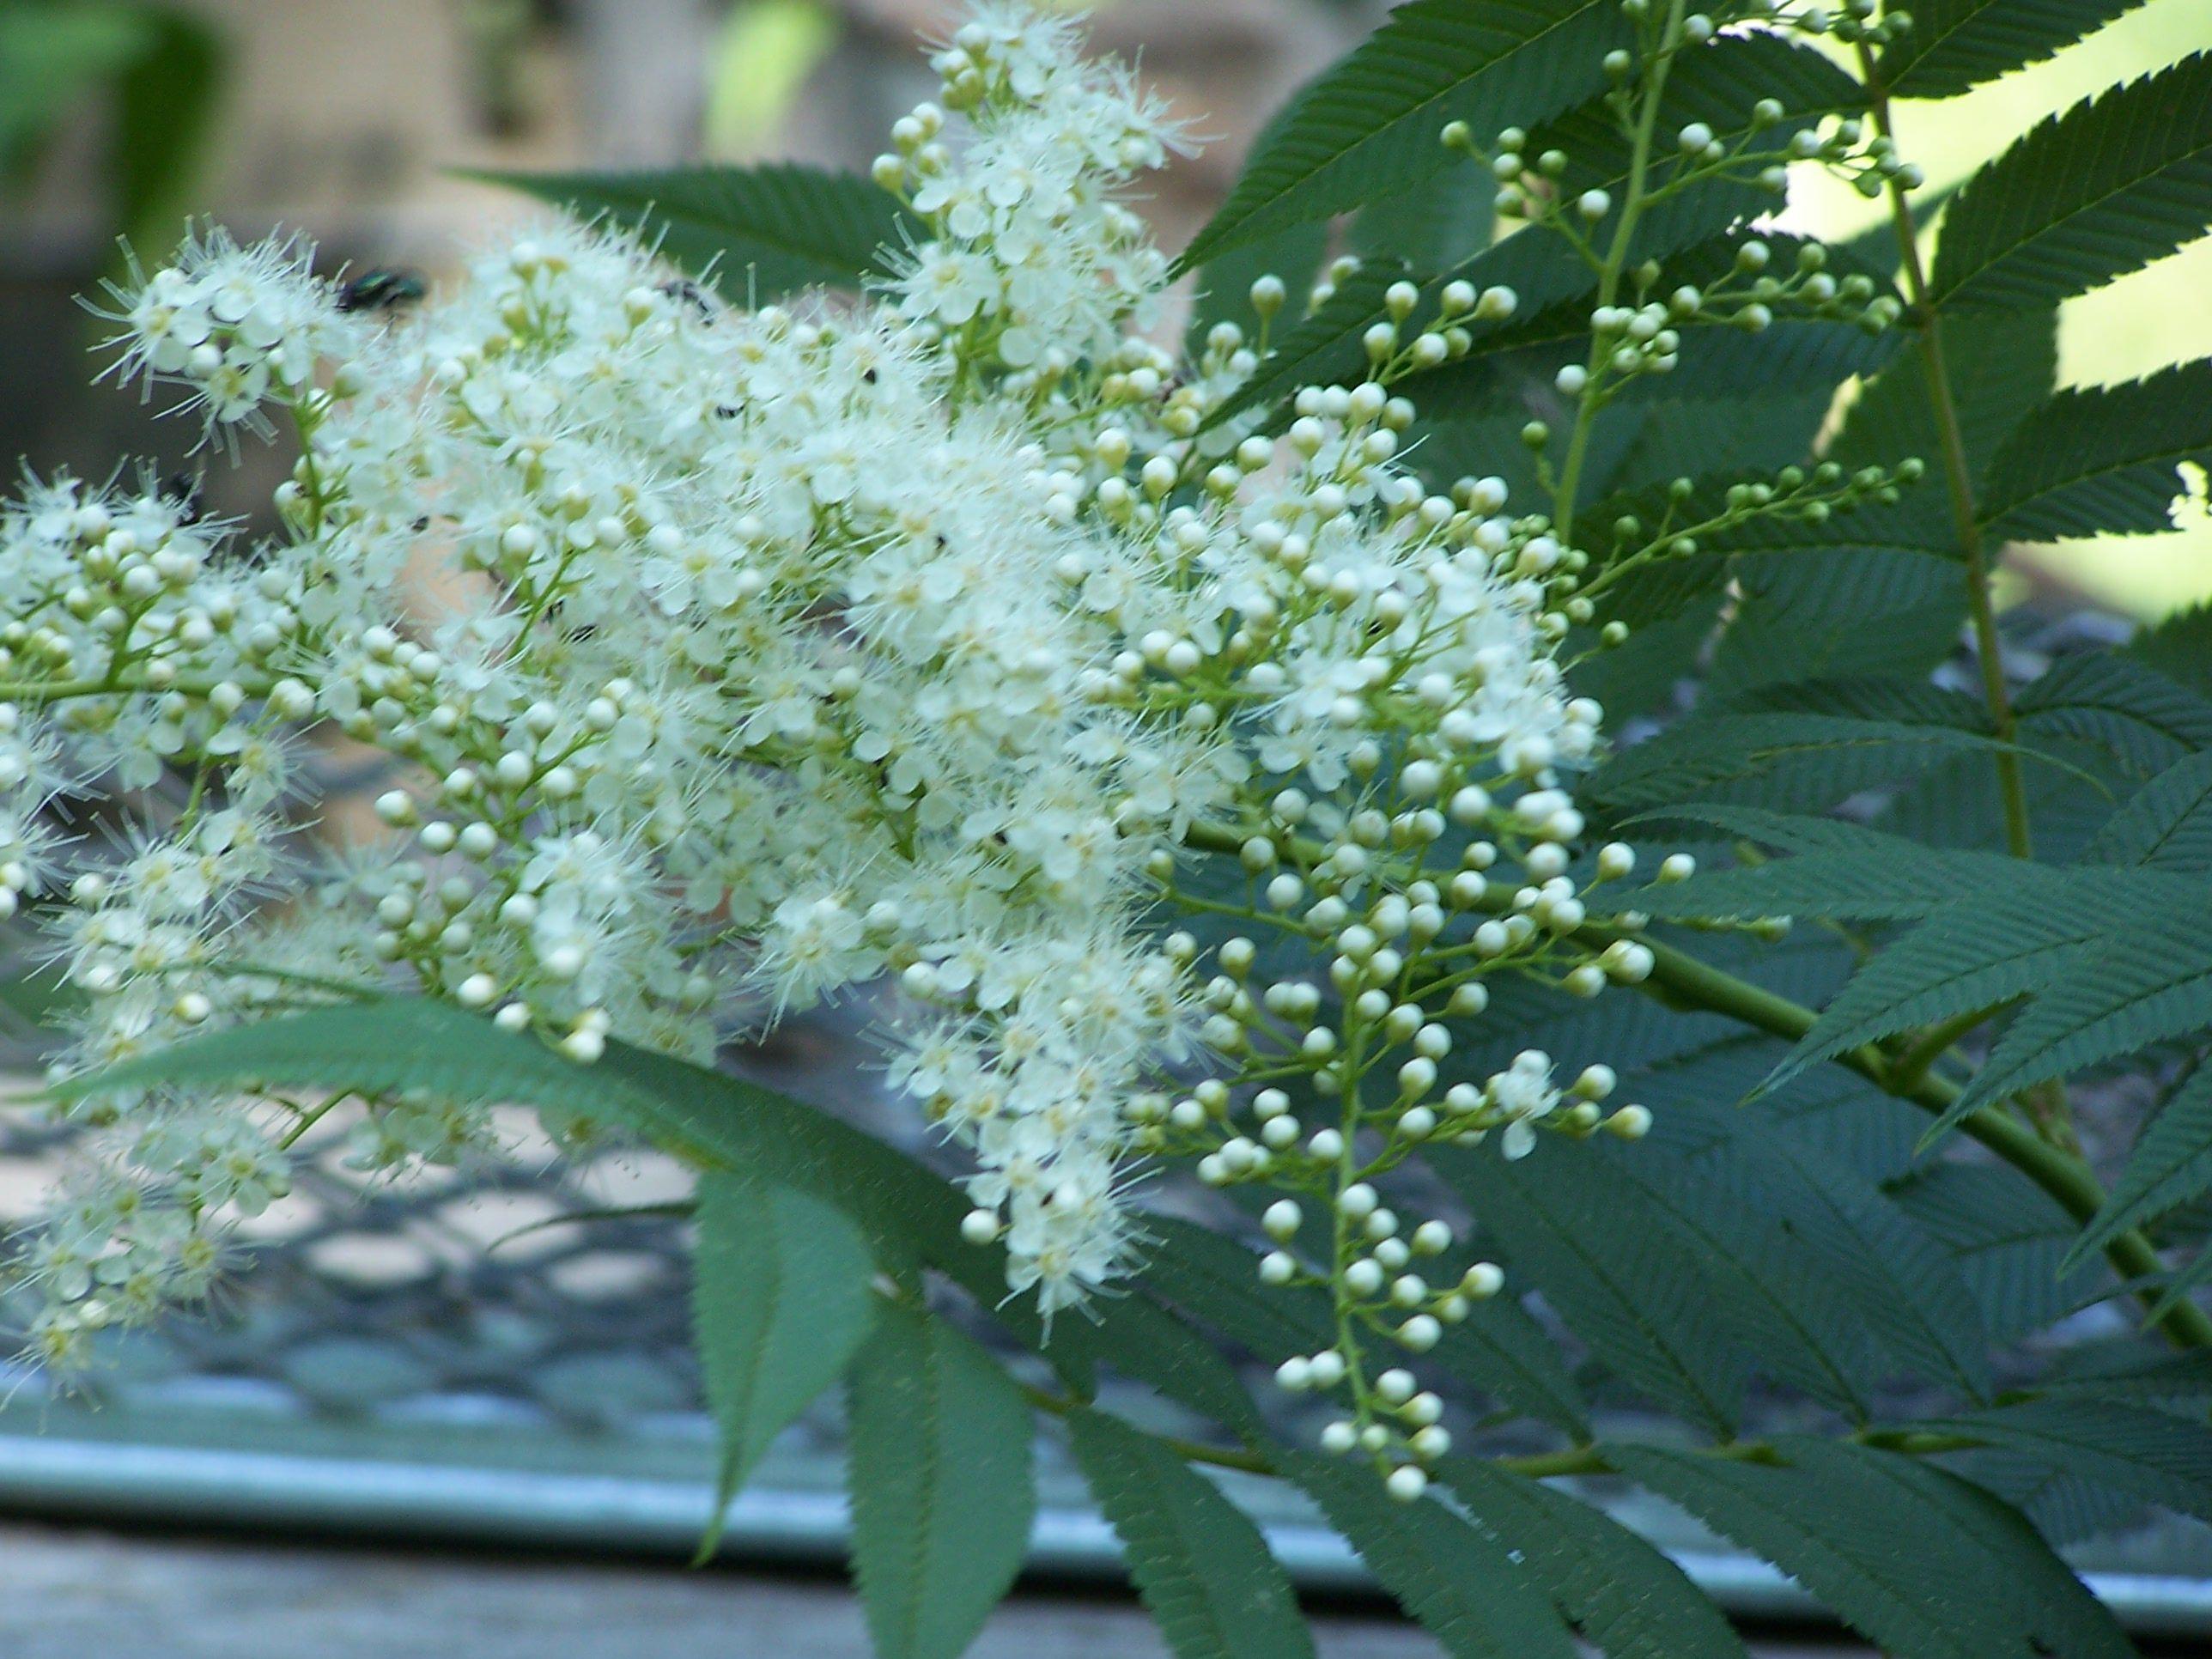 Ural False Spirea Is A Great Shrub For Shade Gardens Shade Shrubs Shade Garden Spirea